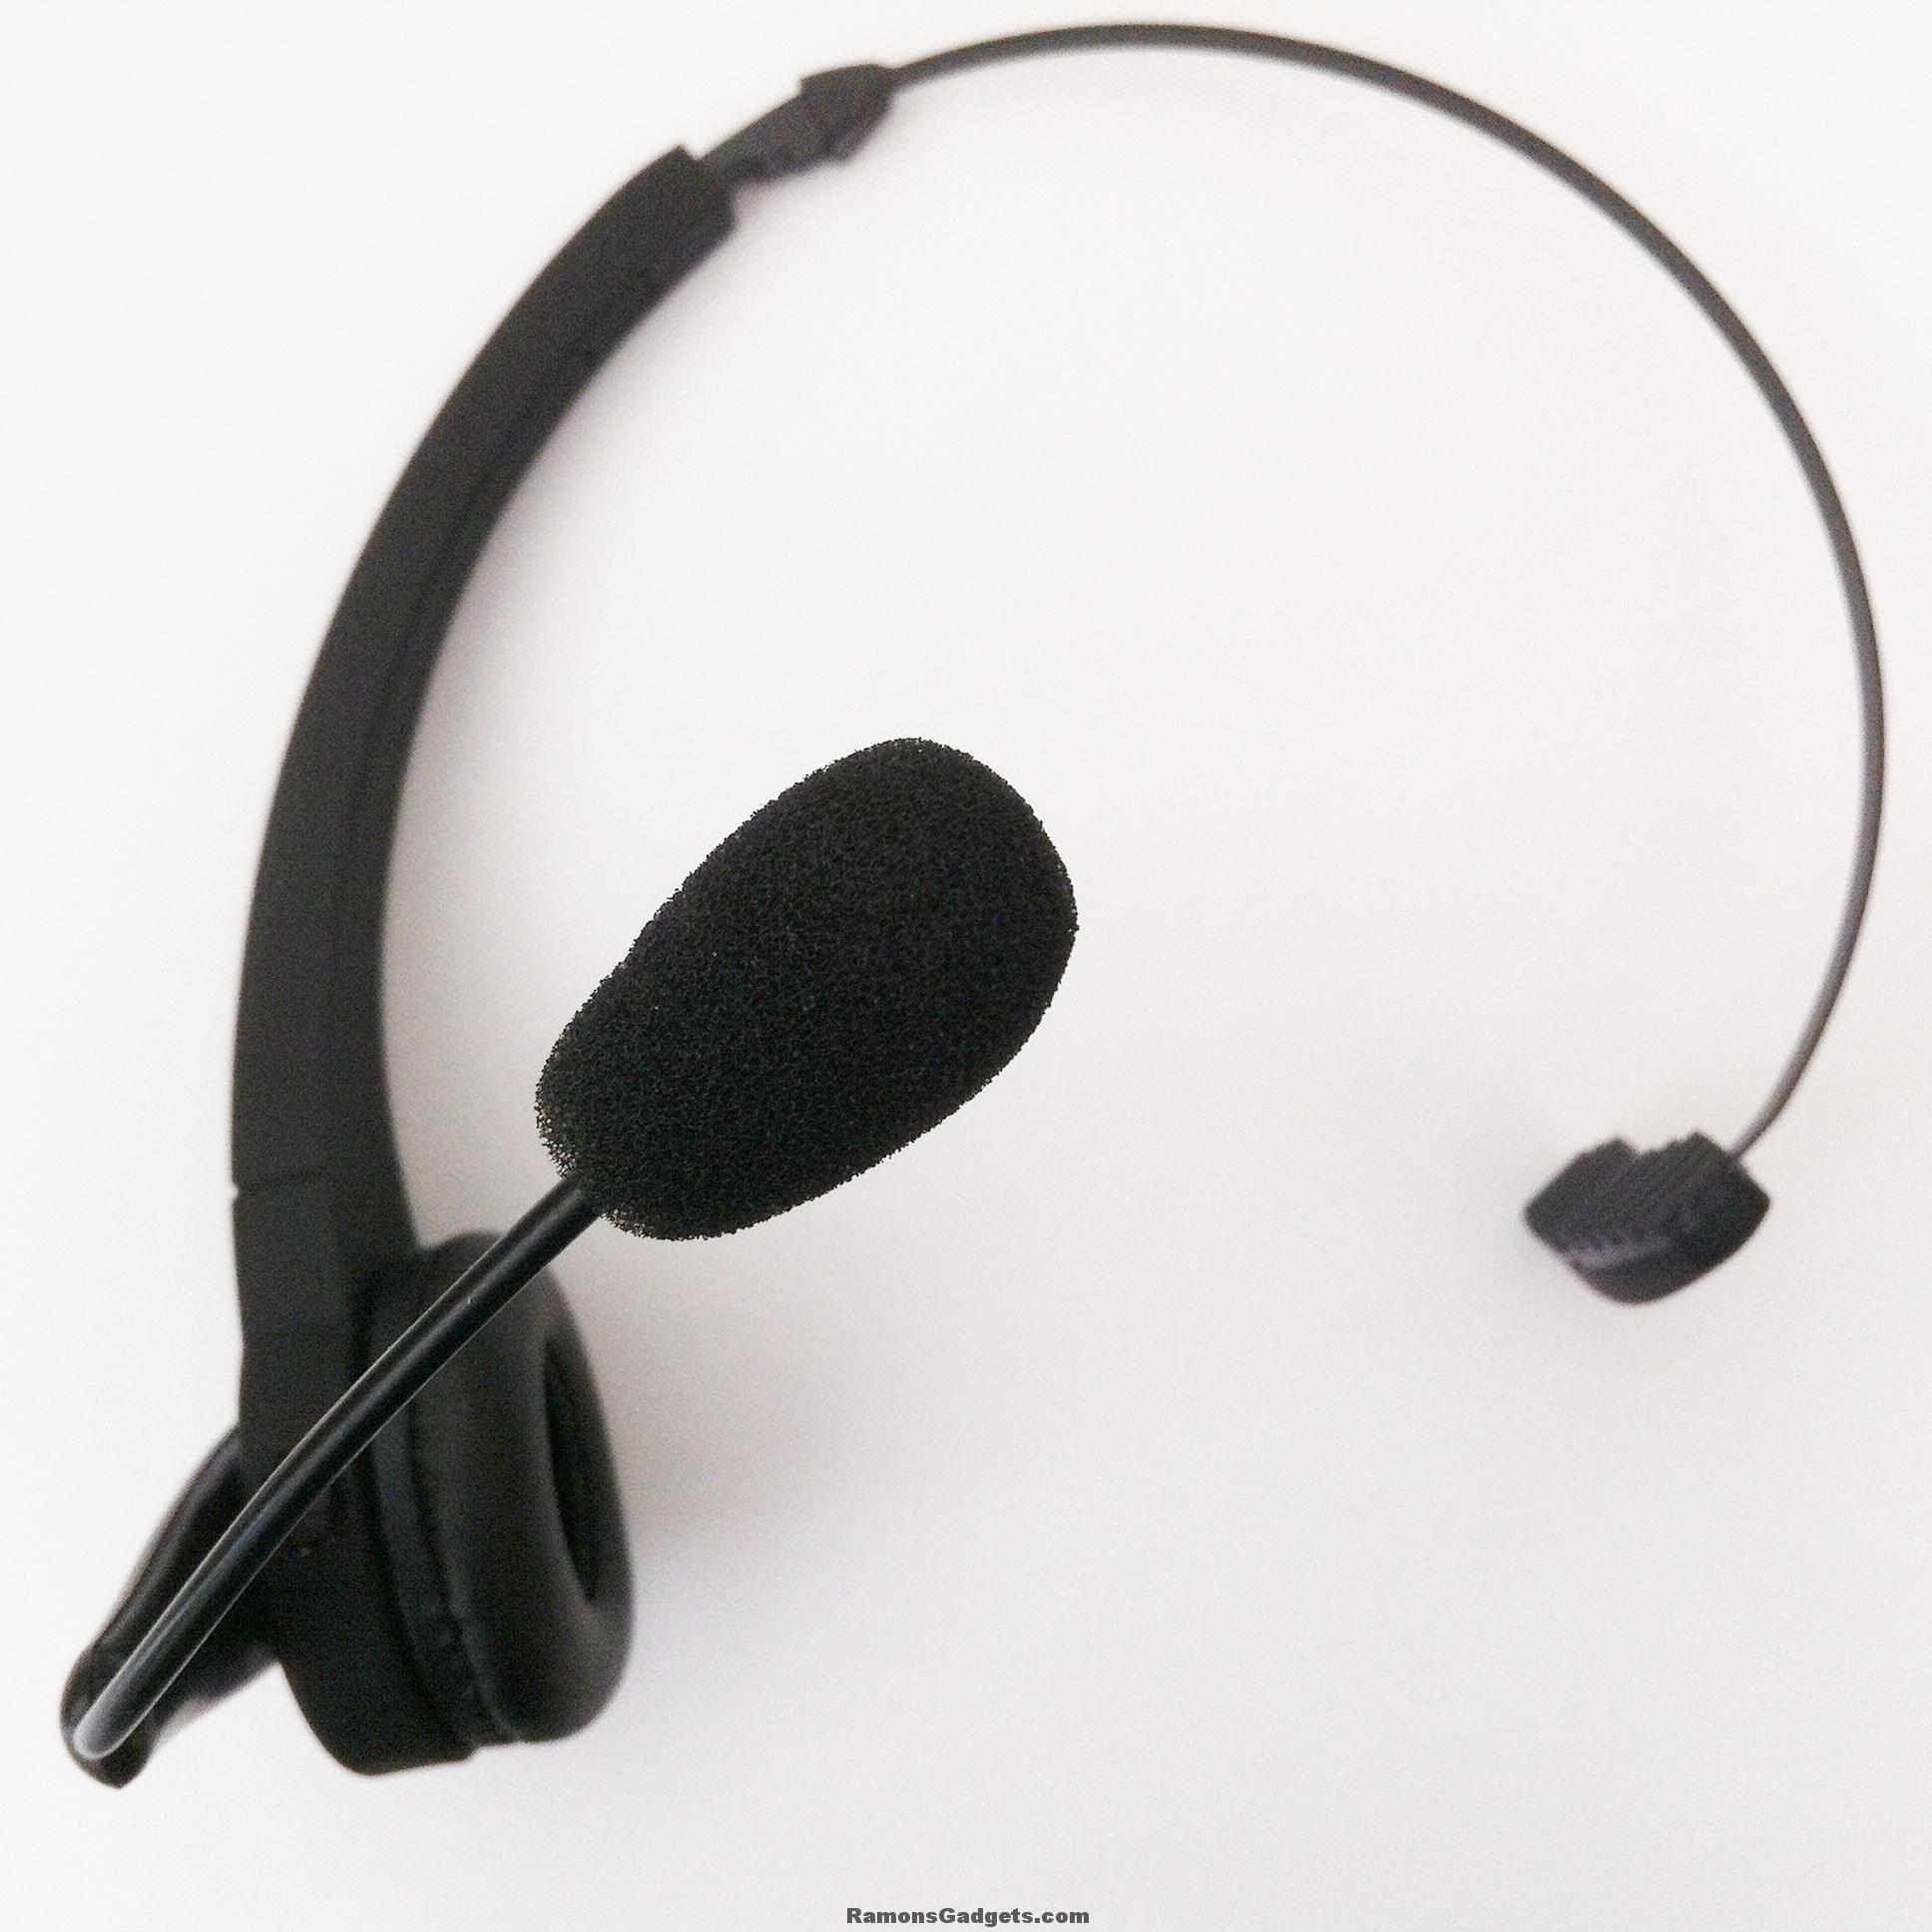 Bluetooth Headset Voor Smartphone, Gaming, Skype, Lync, Ps3 Etc